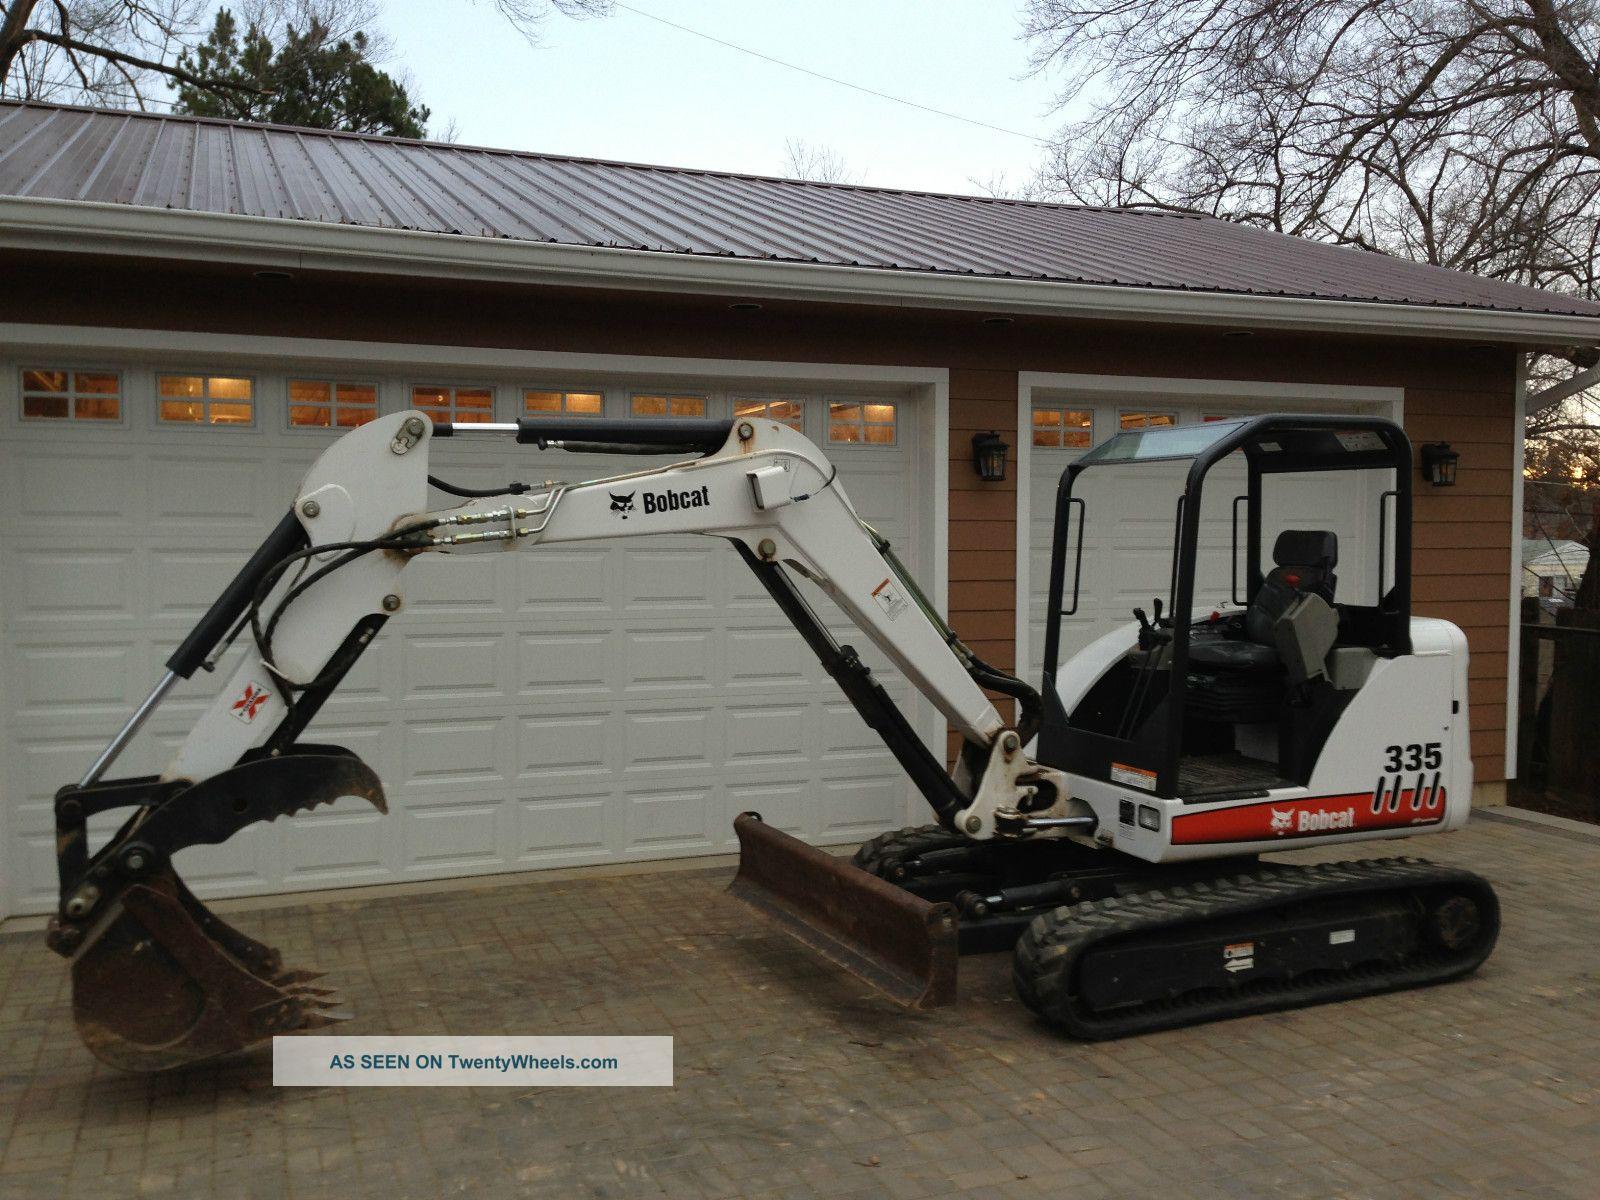 2007 Bobcat 335 Excavator With 24